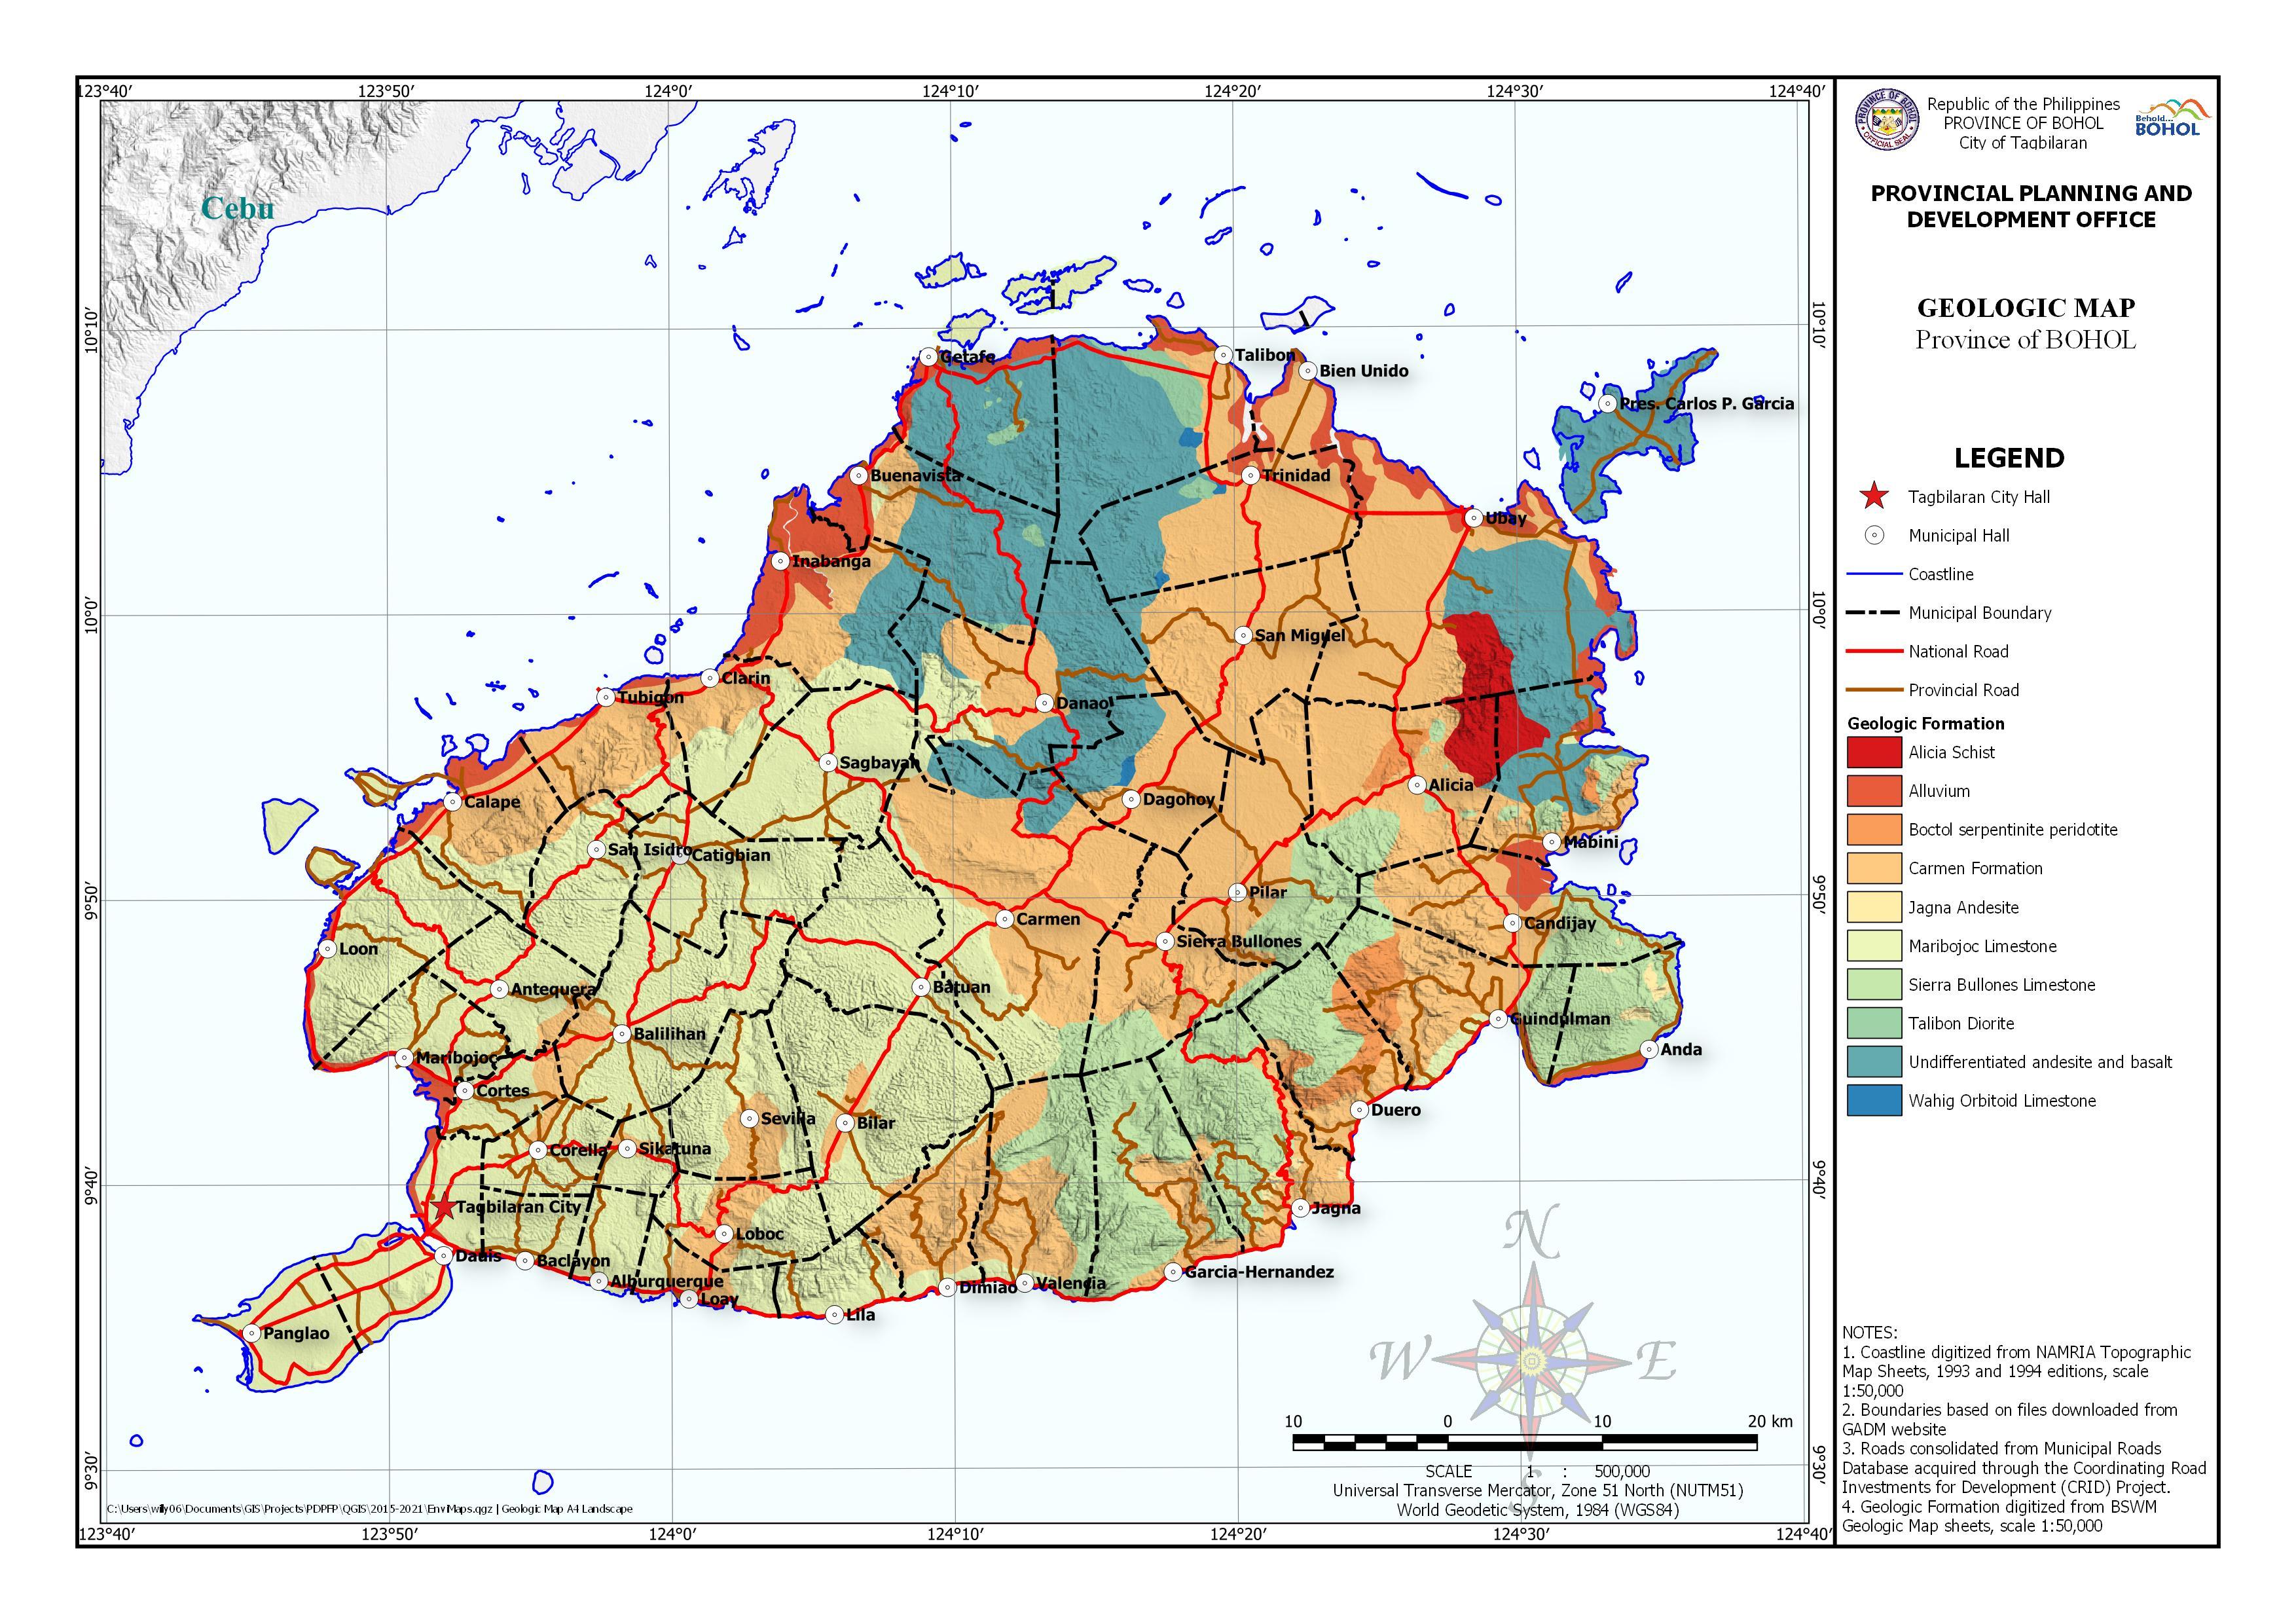 Geologic Map